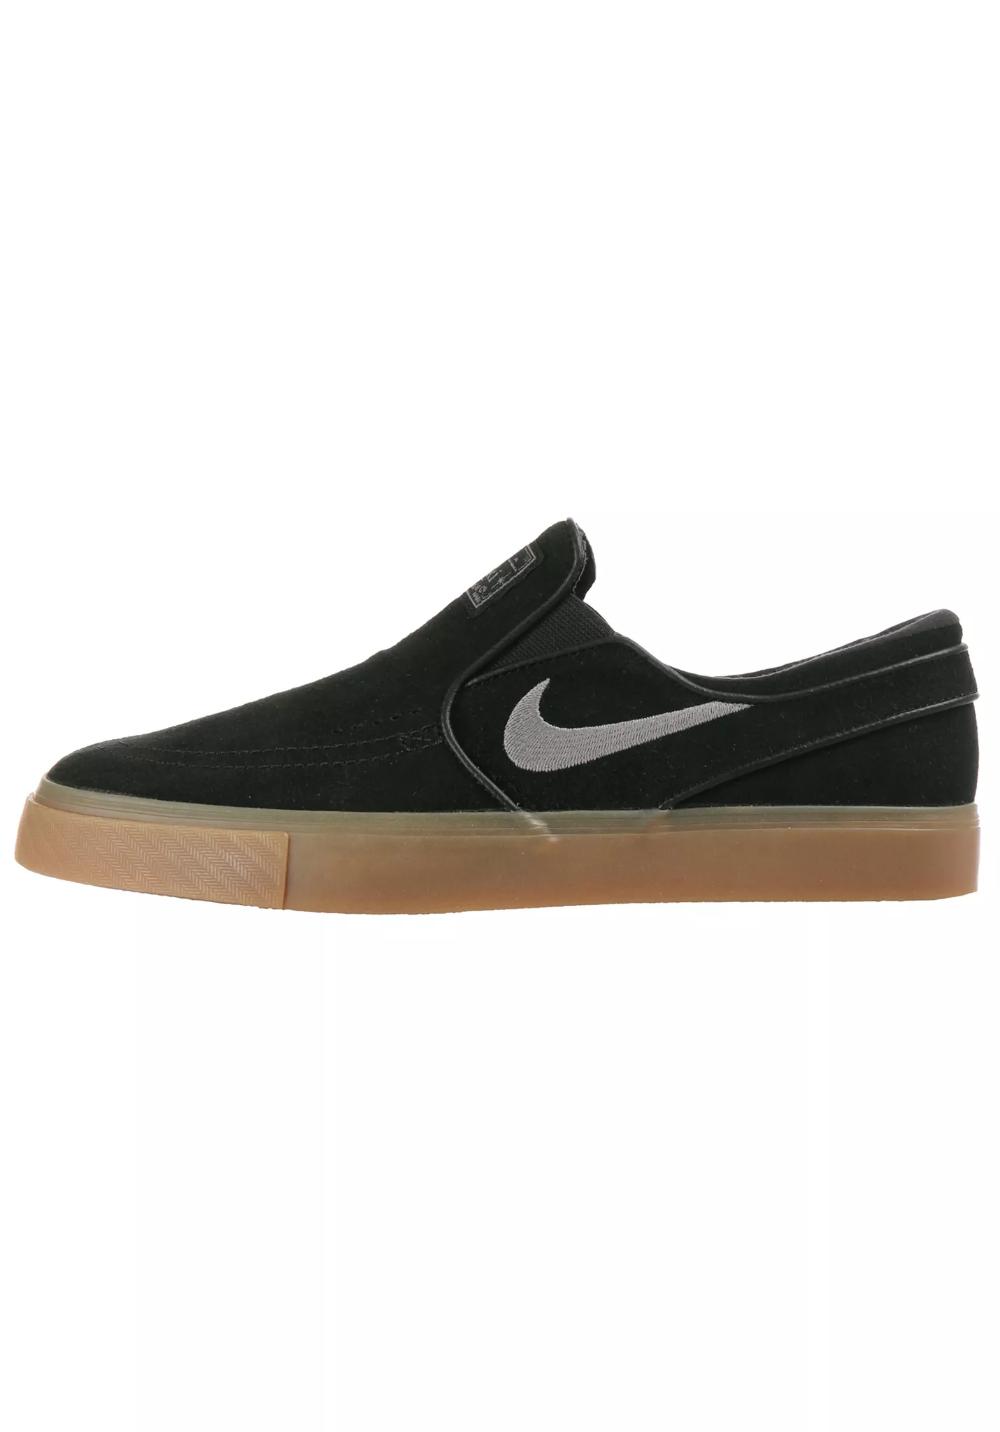 Equivalente Incesante Endulzar  janoski sin cordones - Buscar con Google | Sneakers, Slip on sneaker, Nike  sb